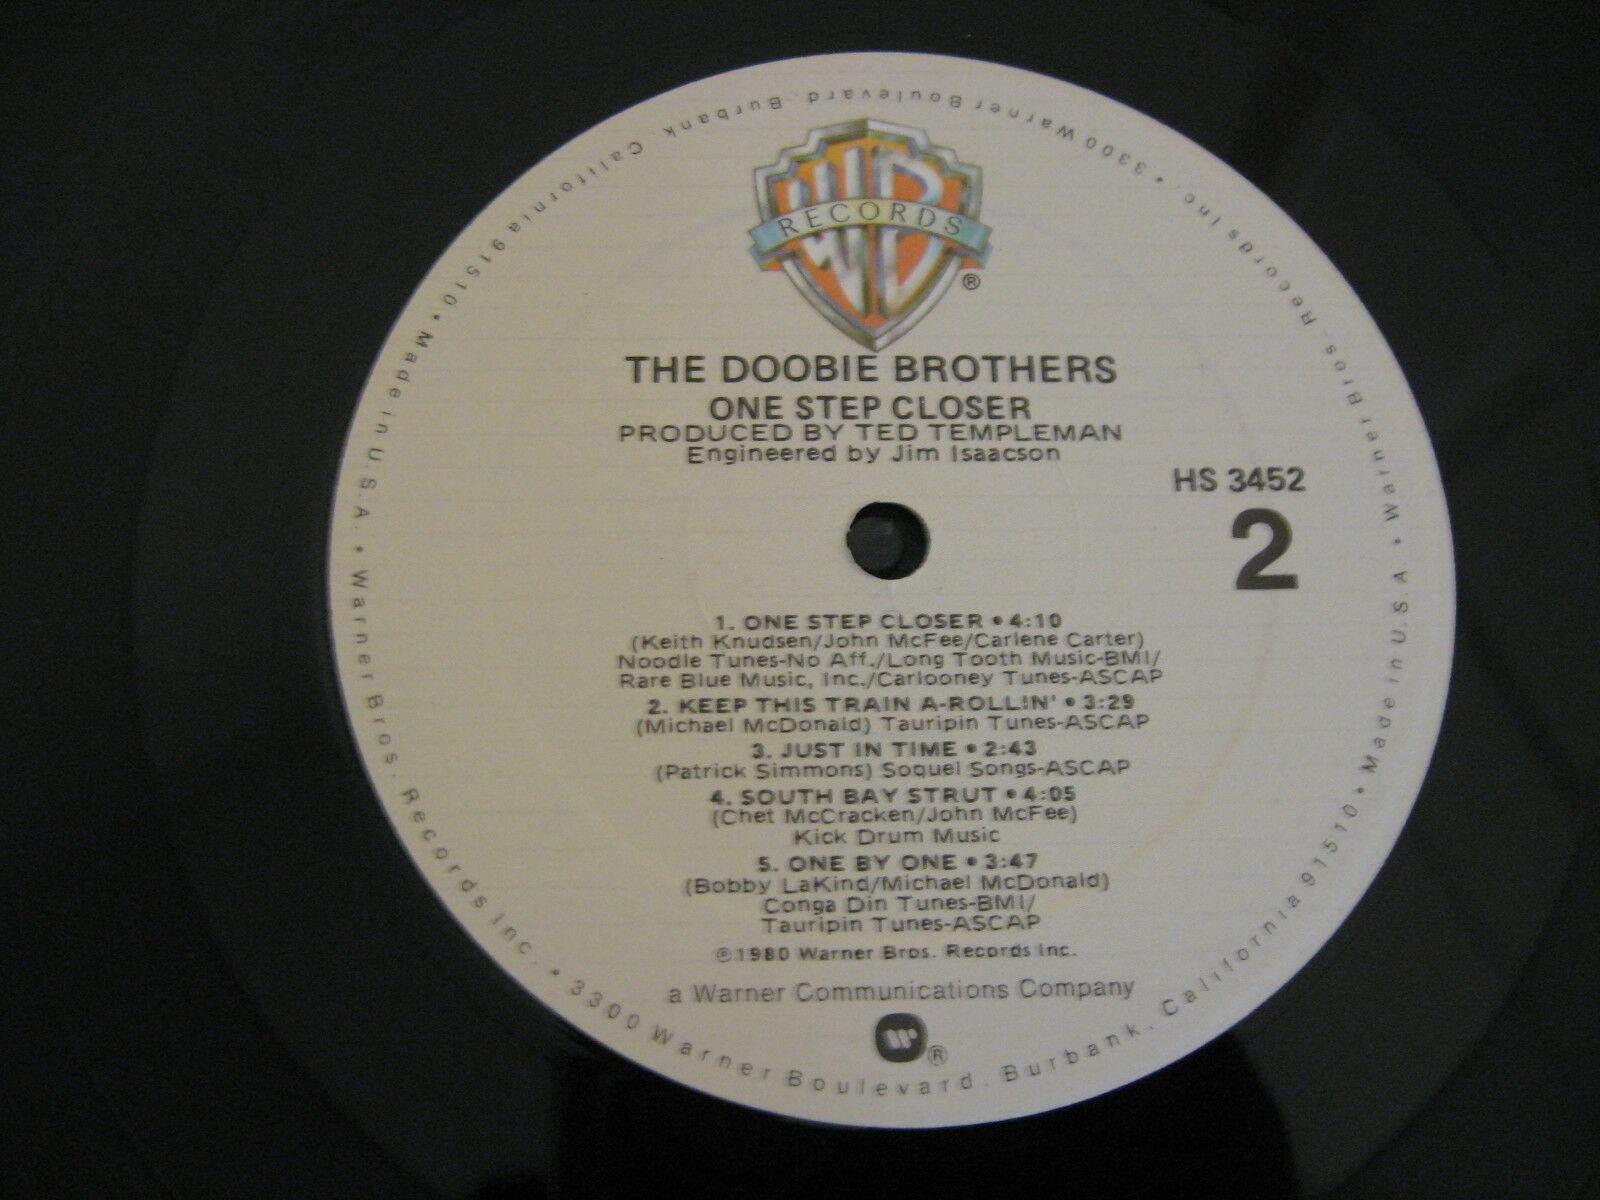 The Doobie Brothers One Step Closer Warner Bros HS3452 Stereo Vinyl LP image 7